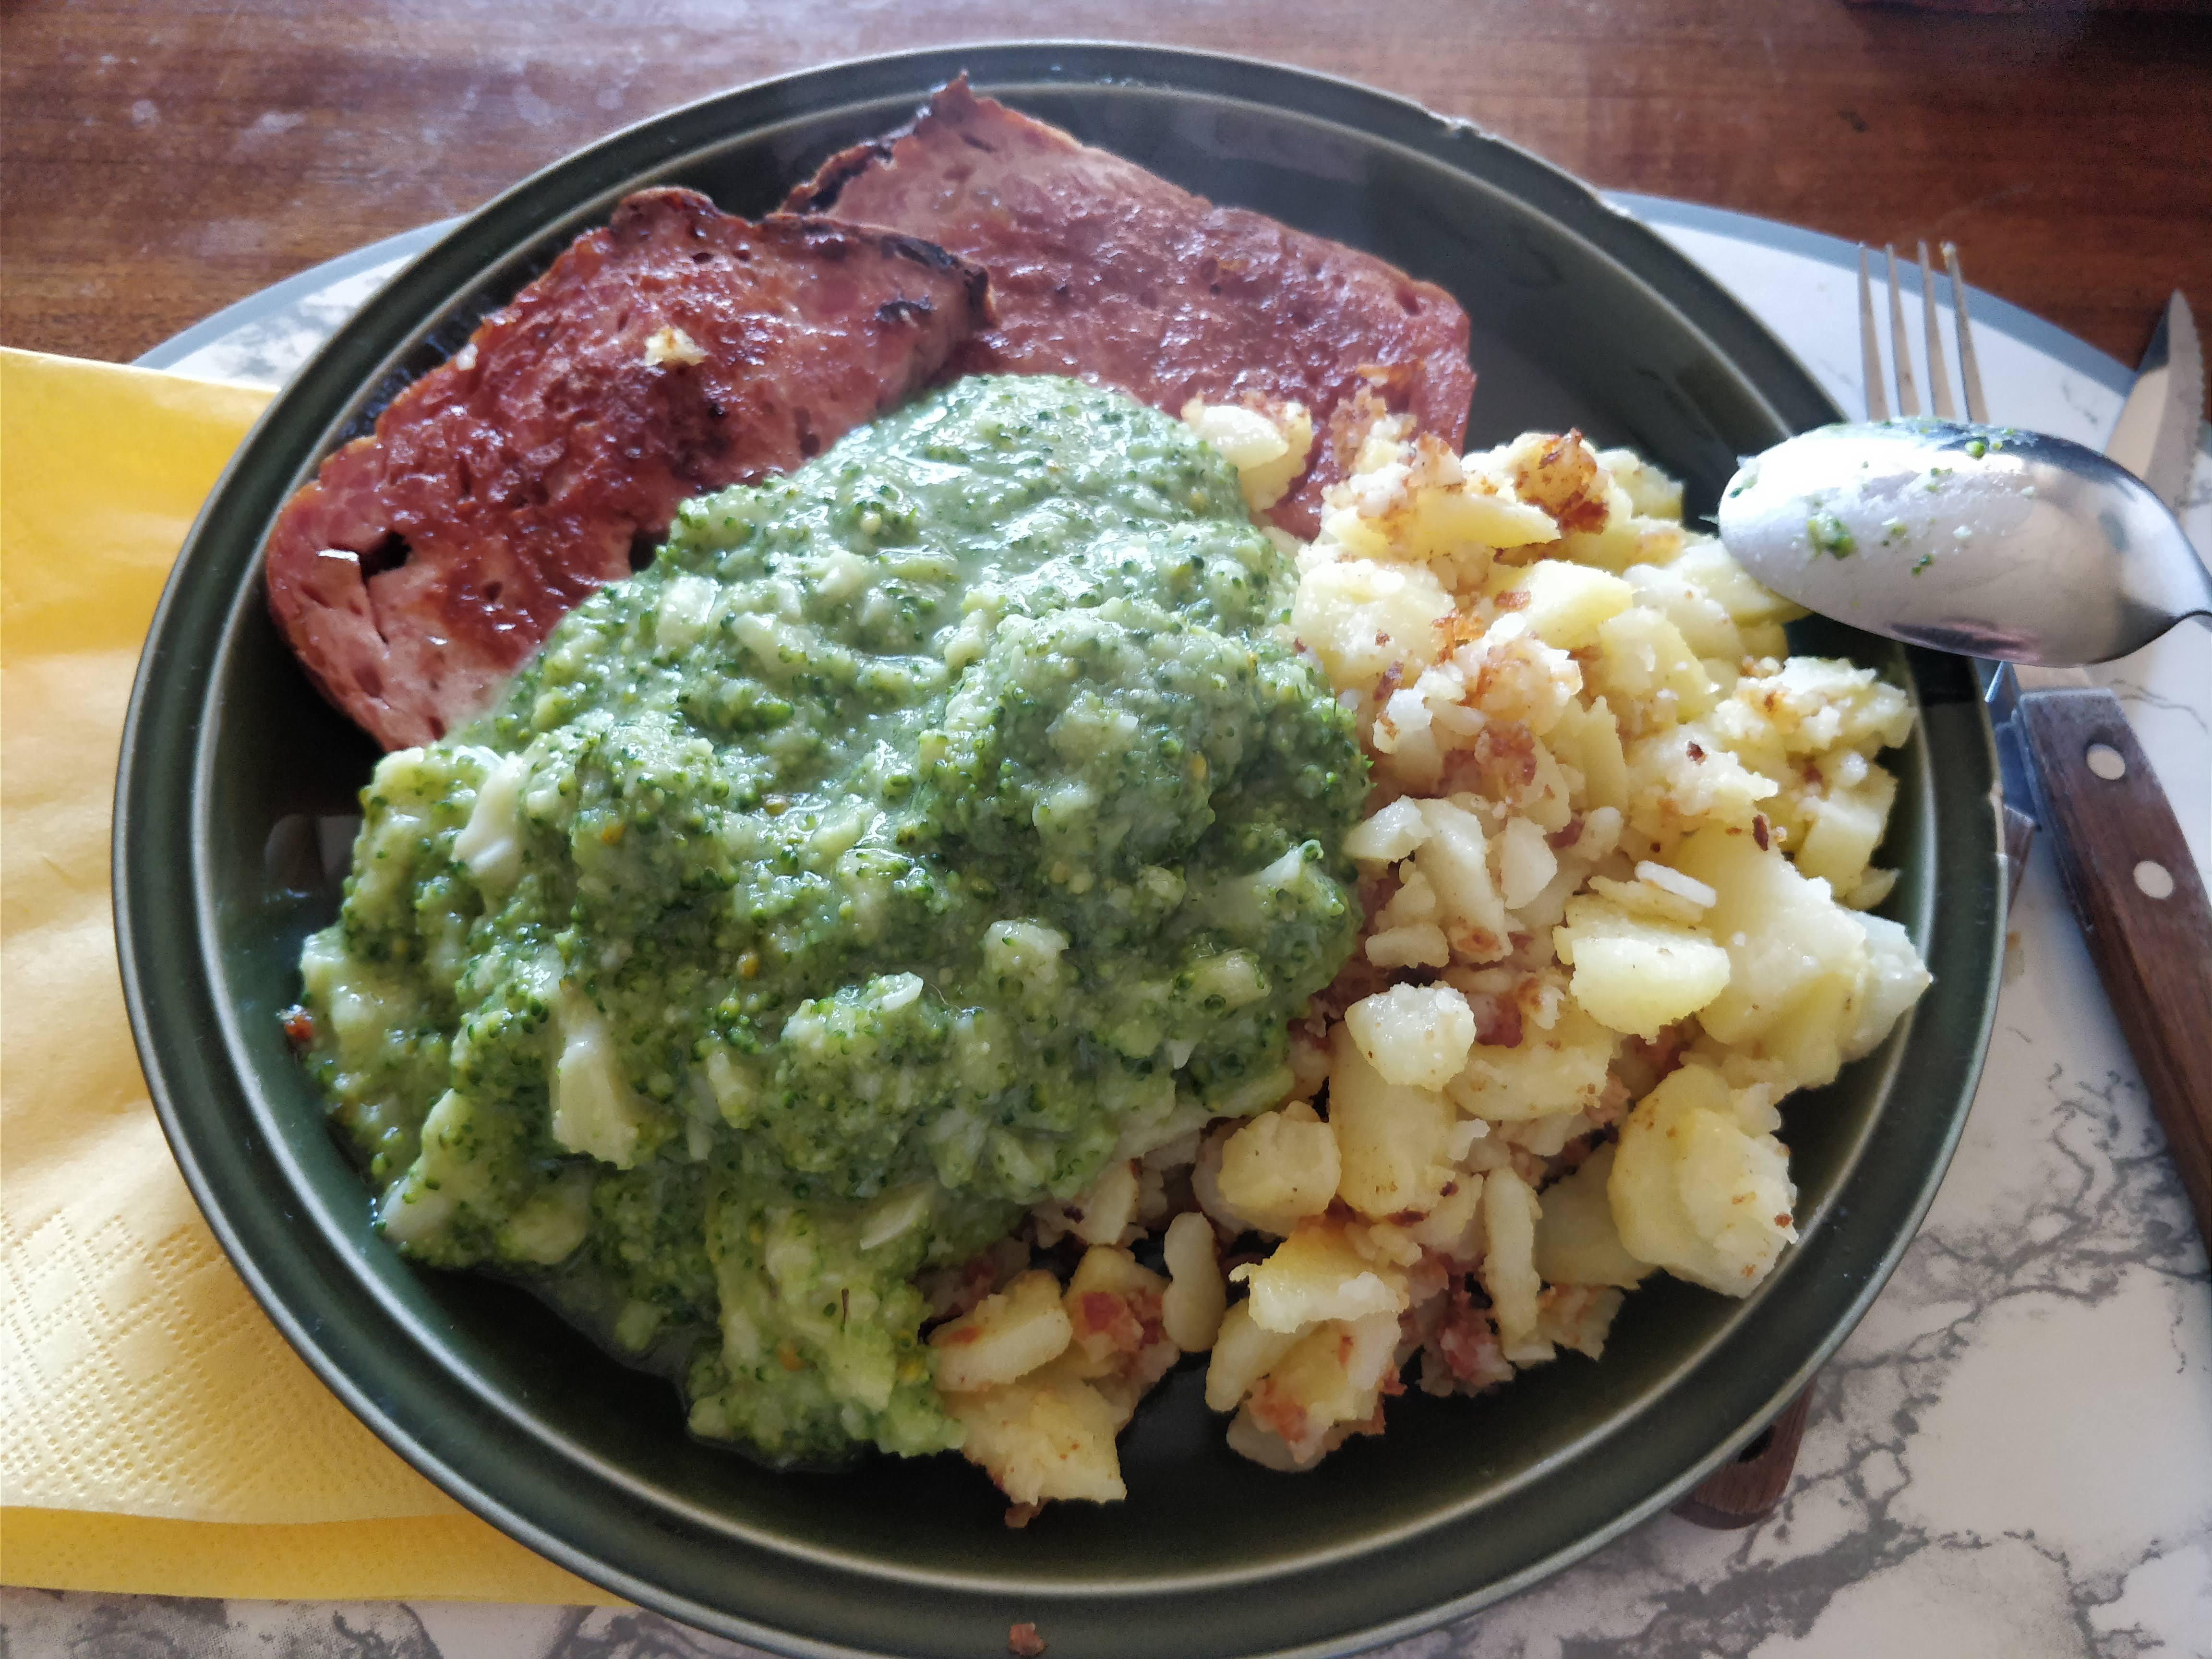 http://foodloader.net/nico_2018-06-20_fleischkaese-bratkartoffeln-brokkoli.jpg